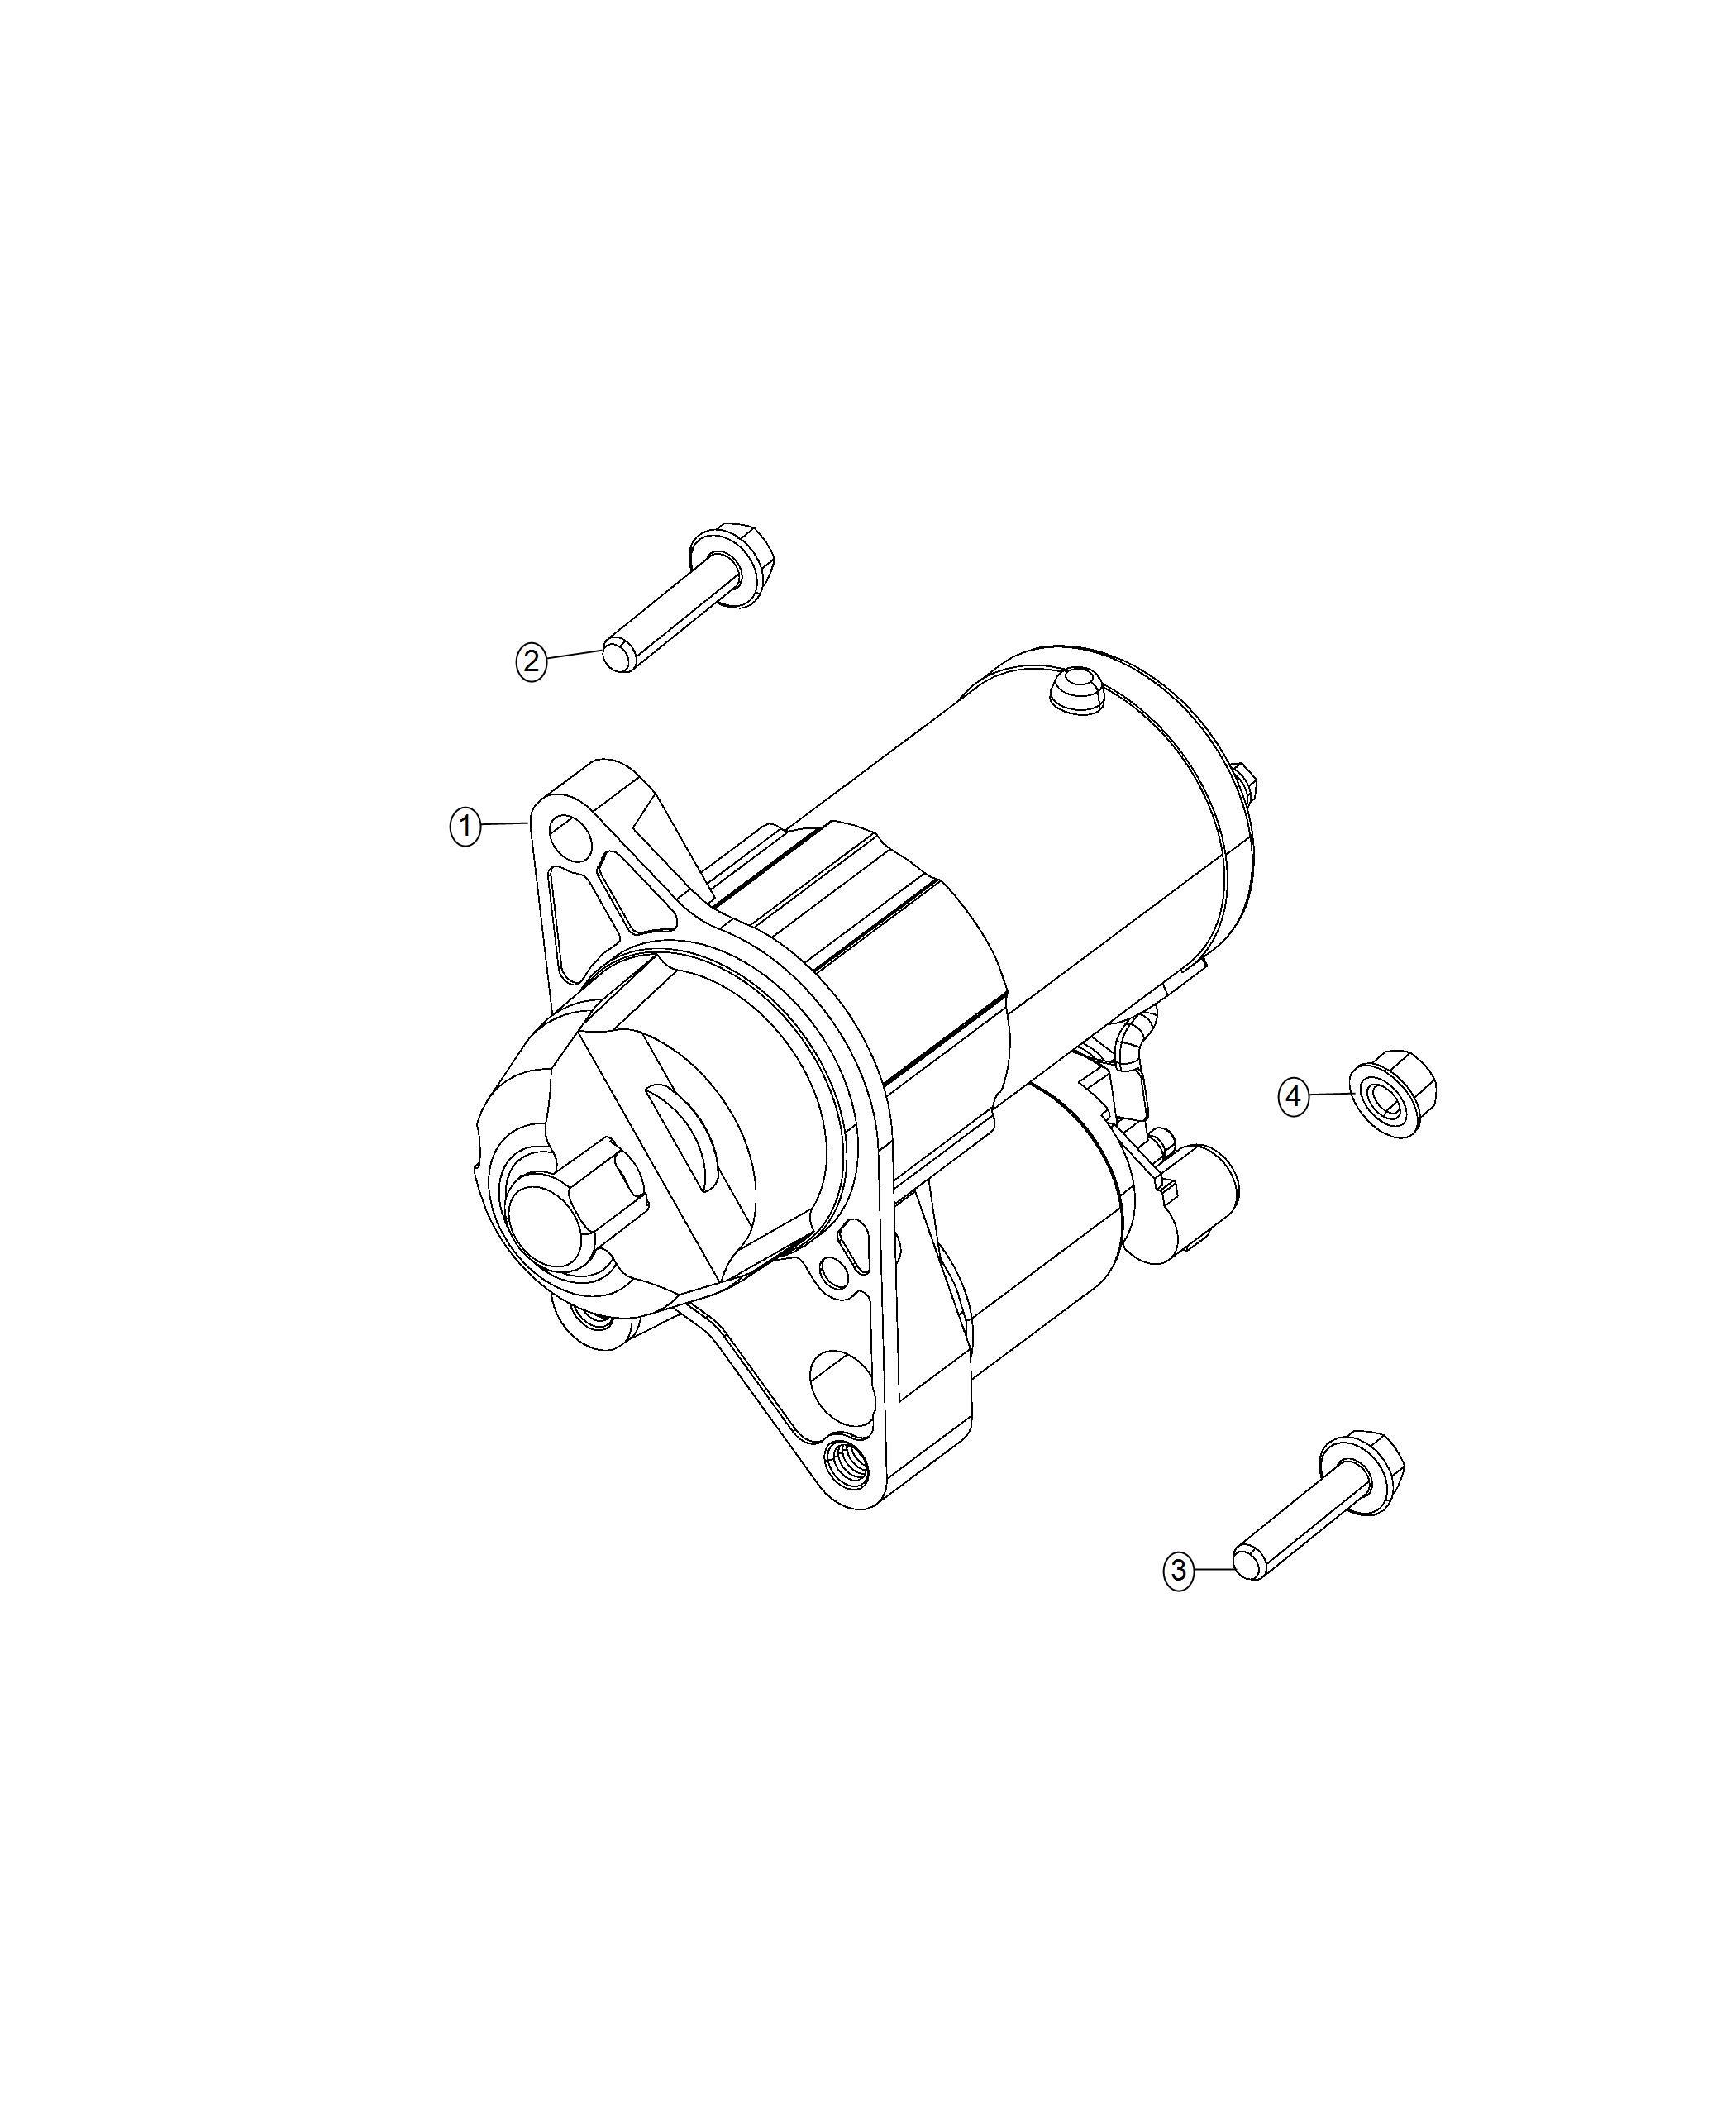 Jeep Compass Starter Engine Power Train Parts Module